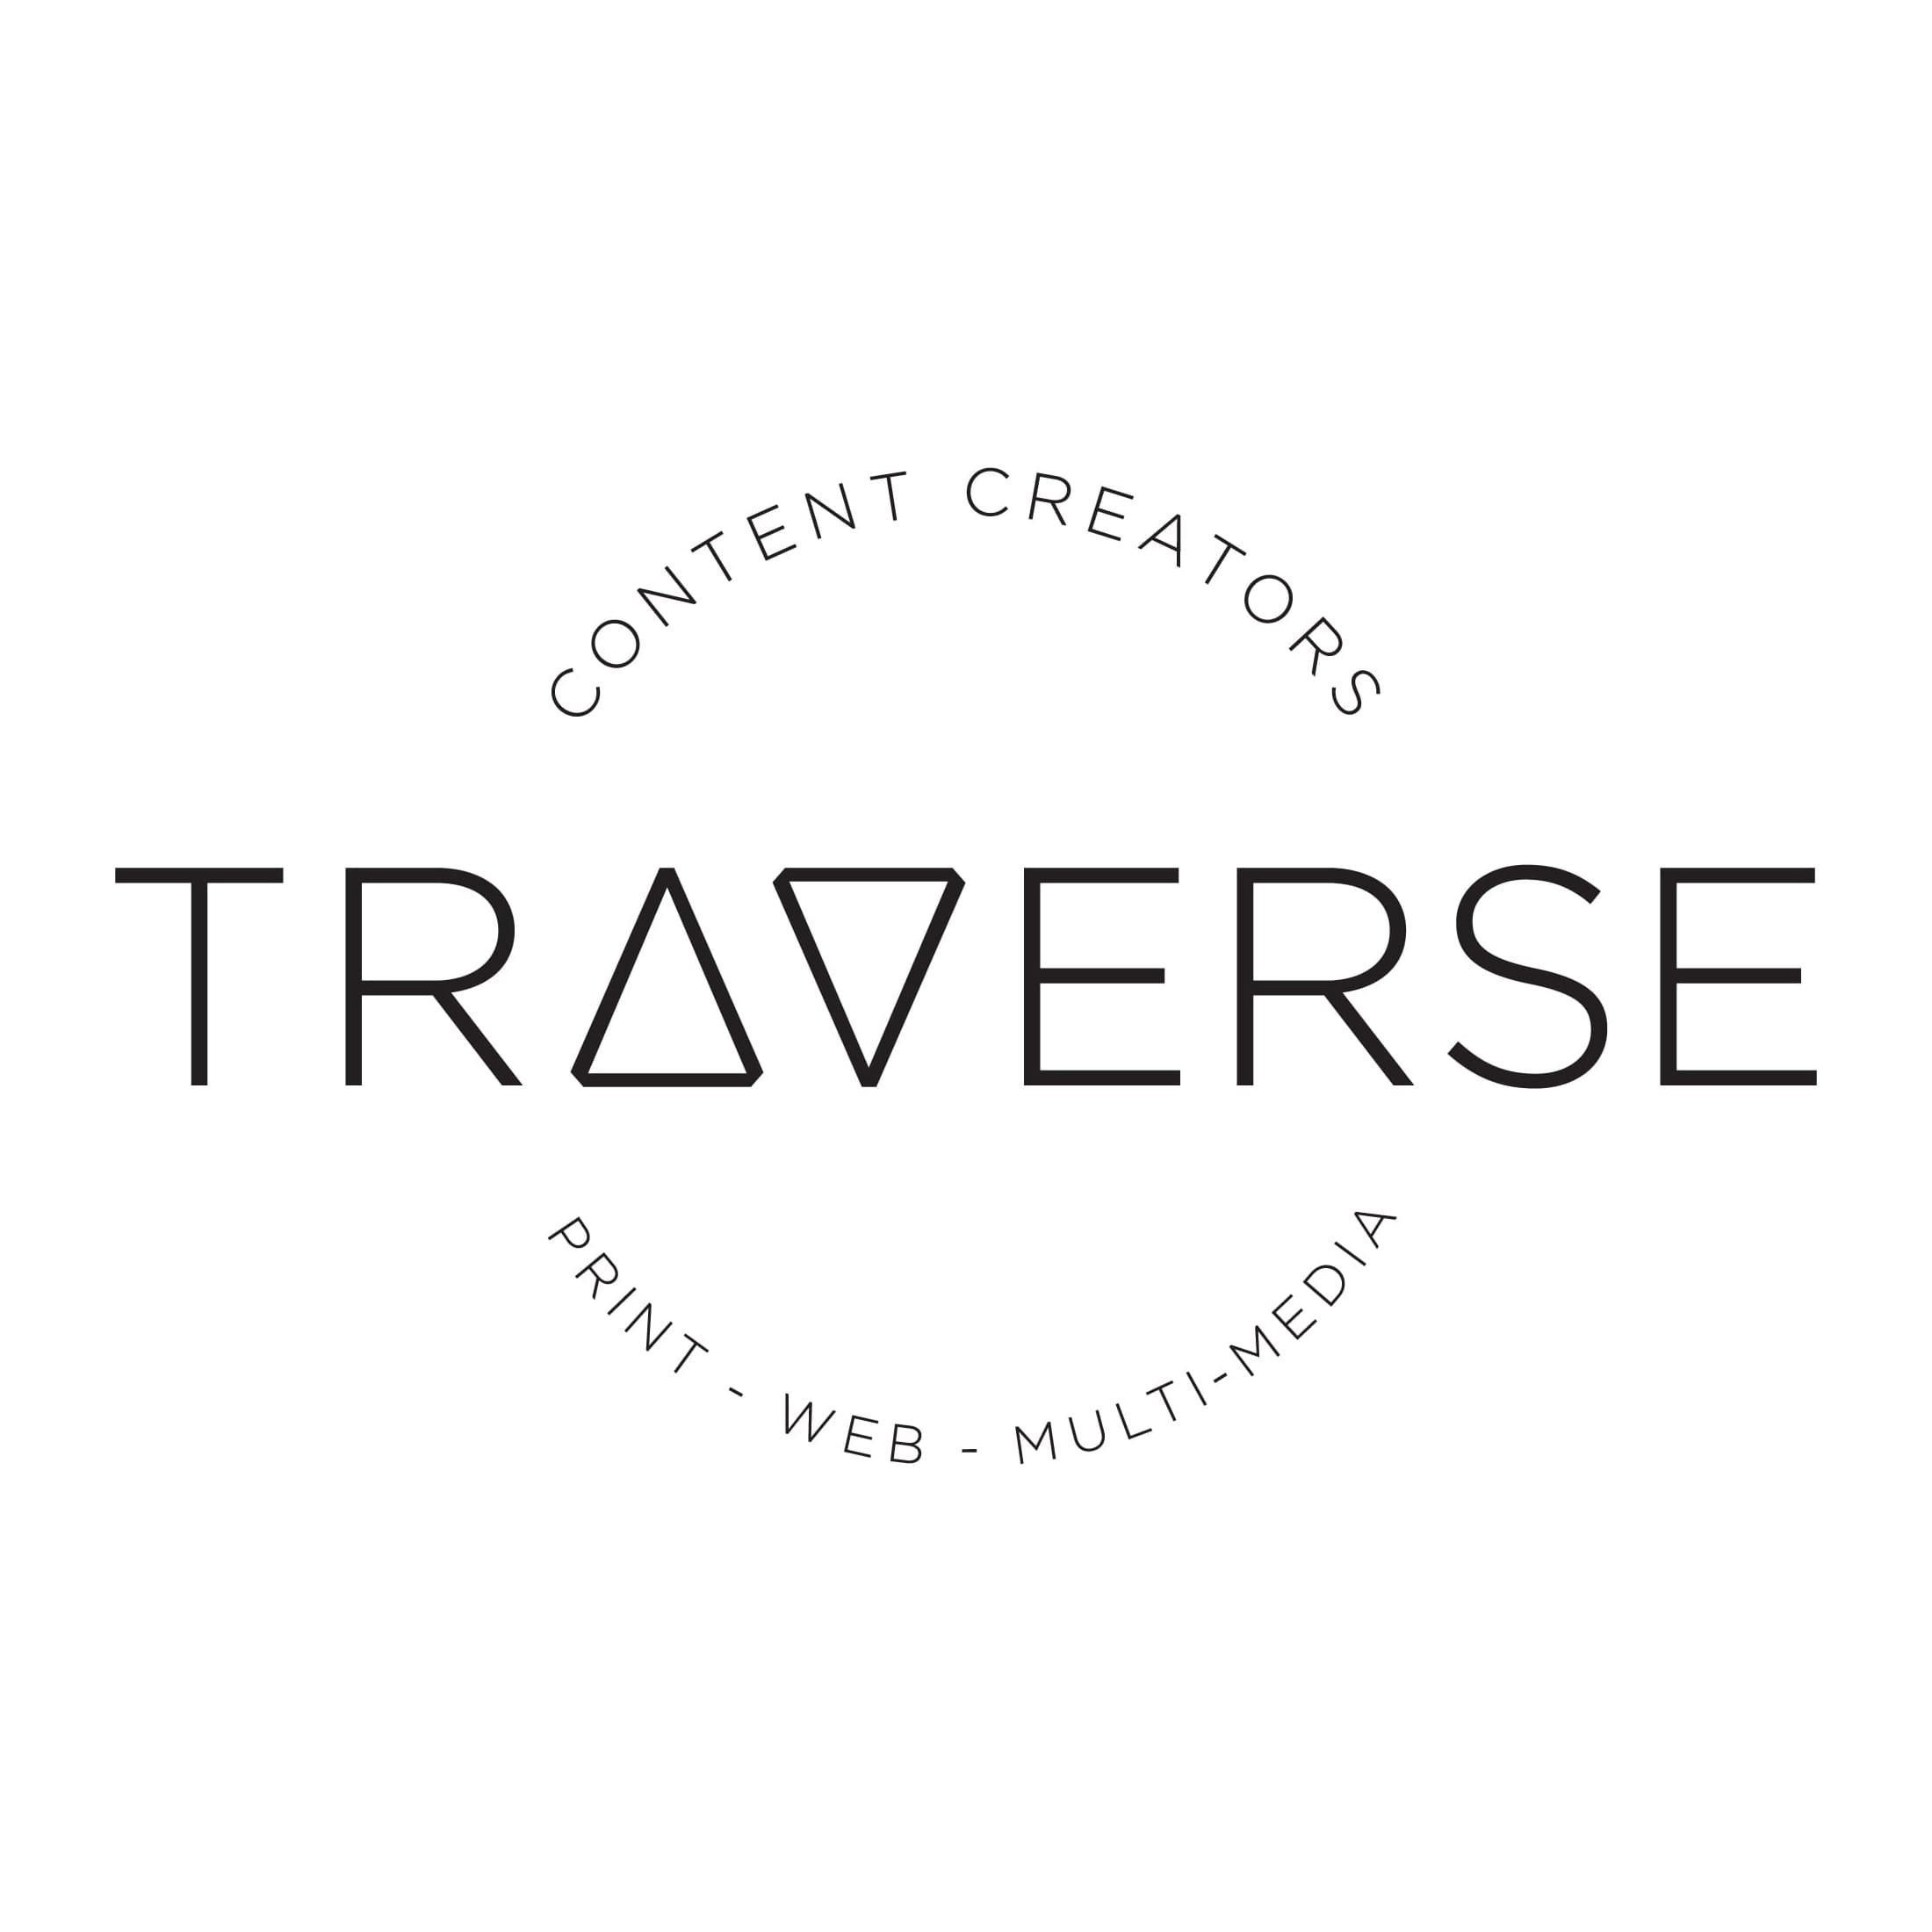 Traverse Design - Web Design & Development,Content CreationEmail: info@traversedesign.coWebsite: traversedesign.co